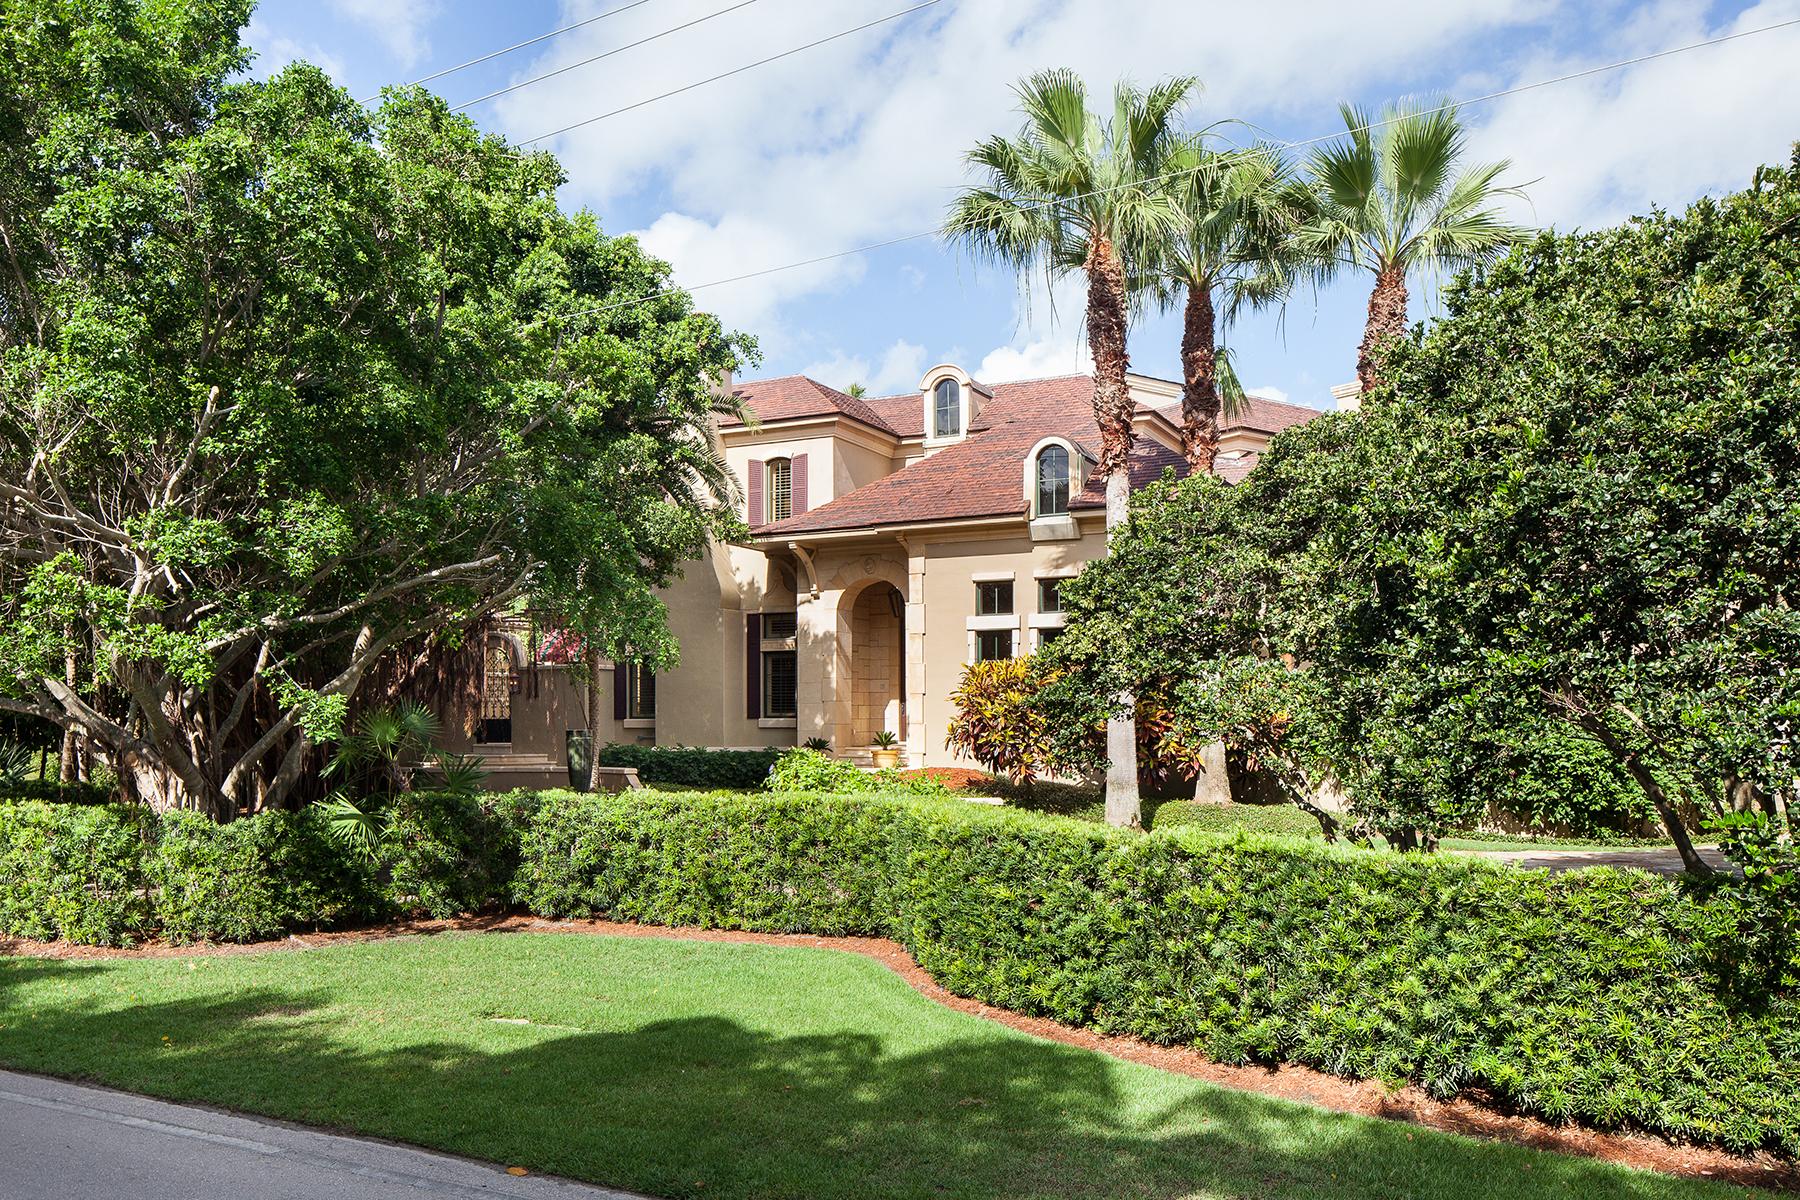 Additional photo for property listing at 3200 Gordon Dr , Naples, FL 34102 3200  Gordon Dr,  Naples, Florida 34102 United States